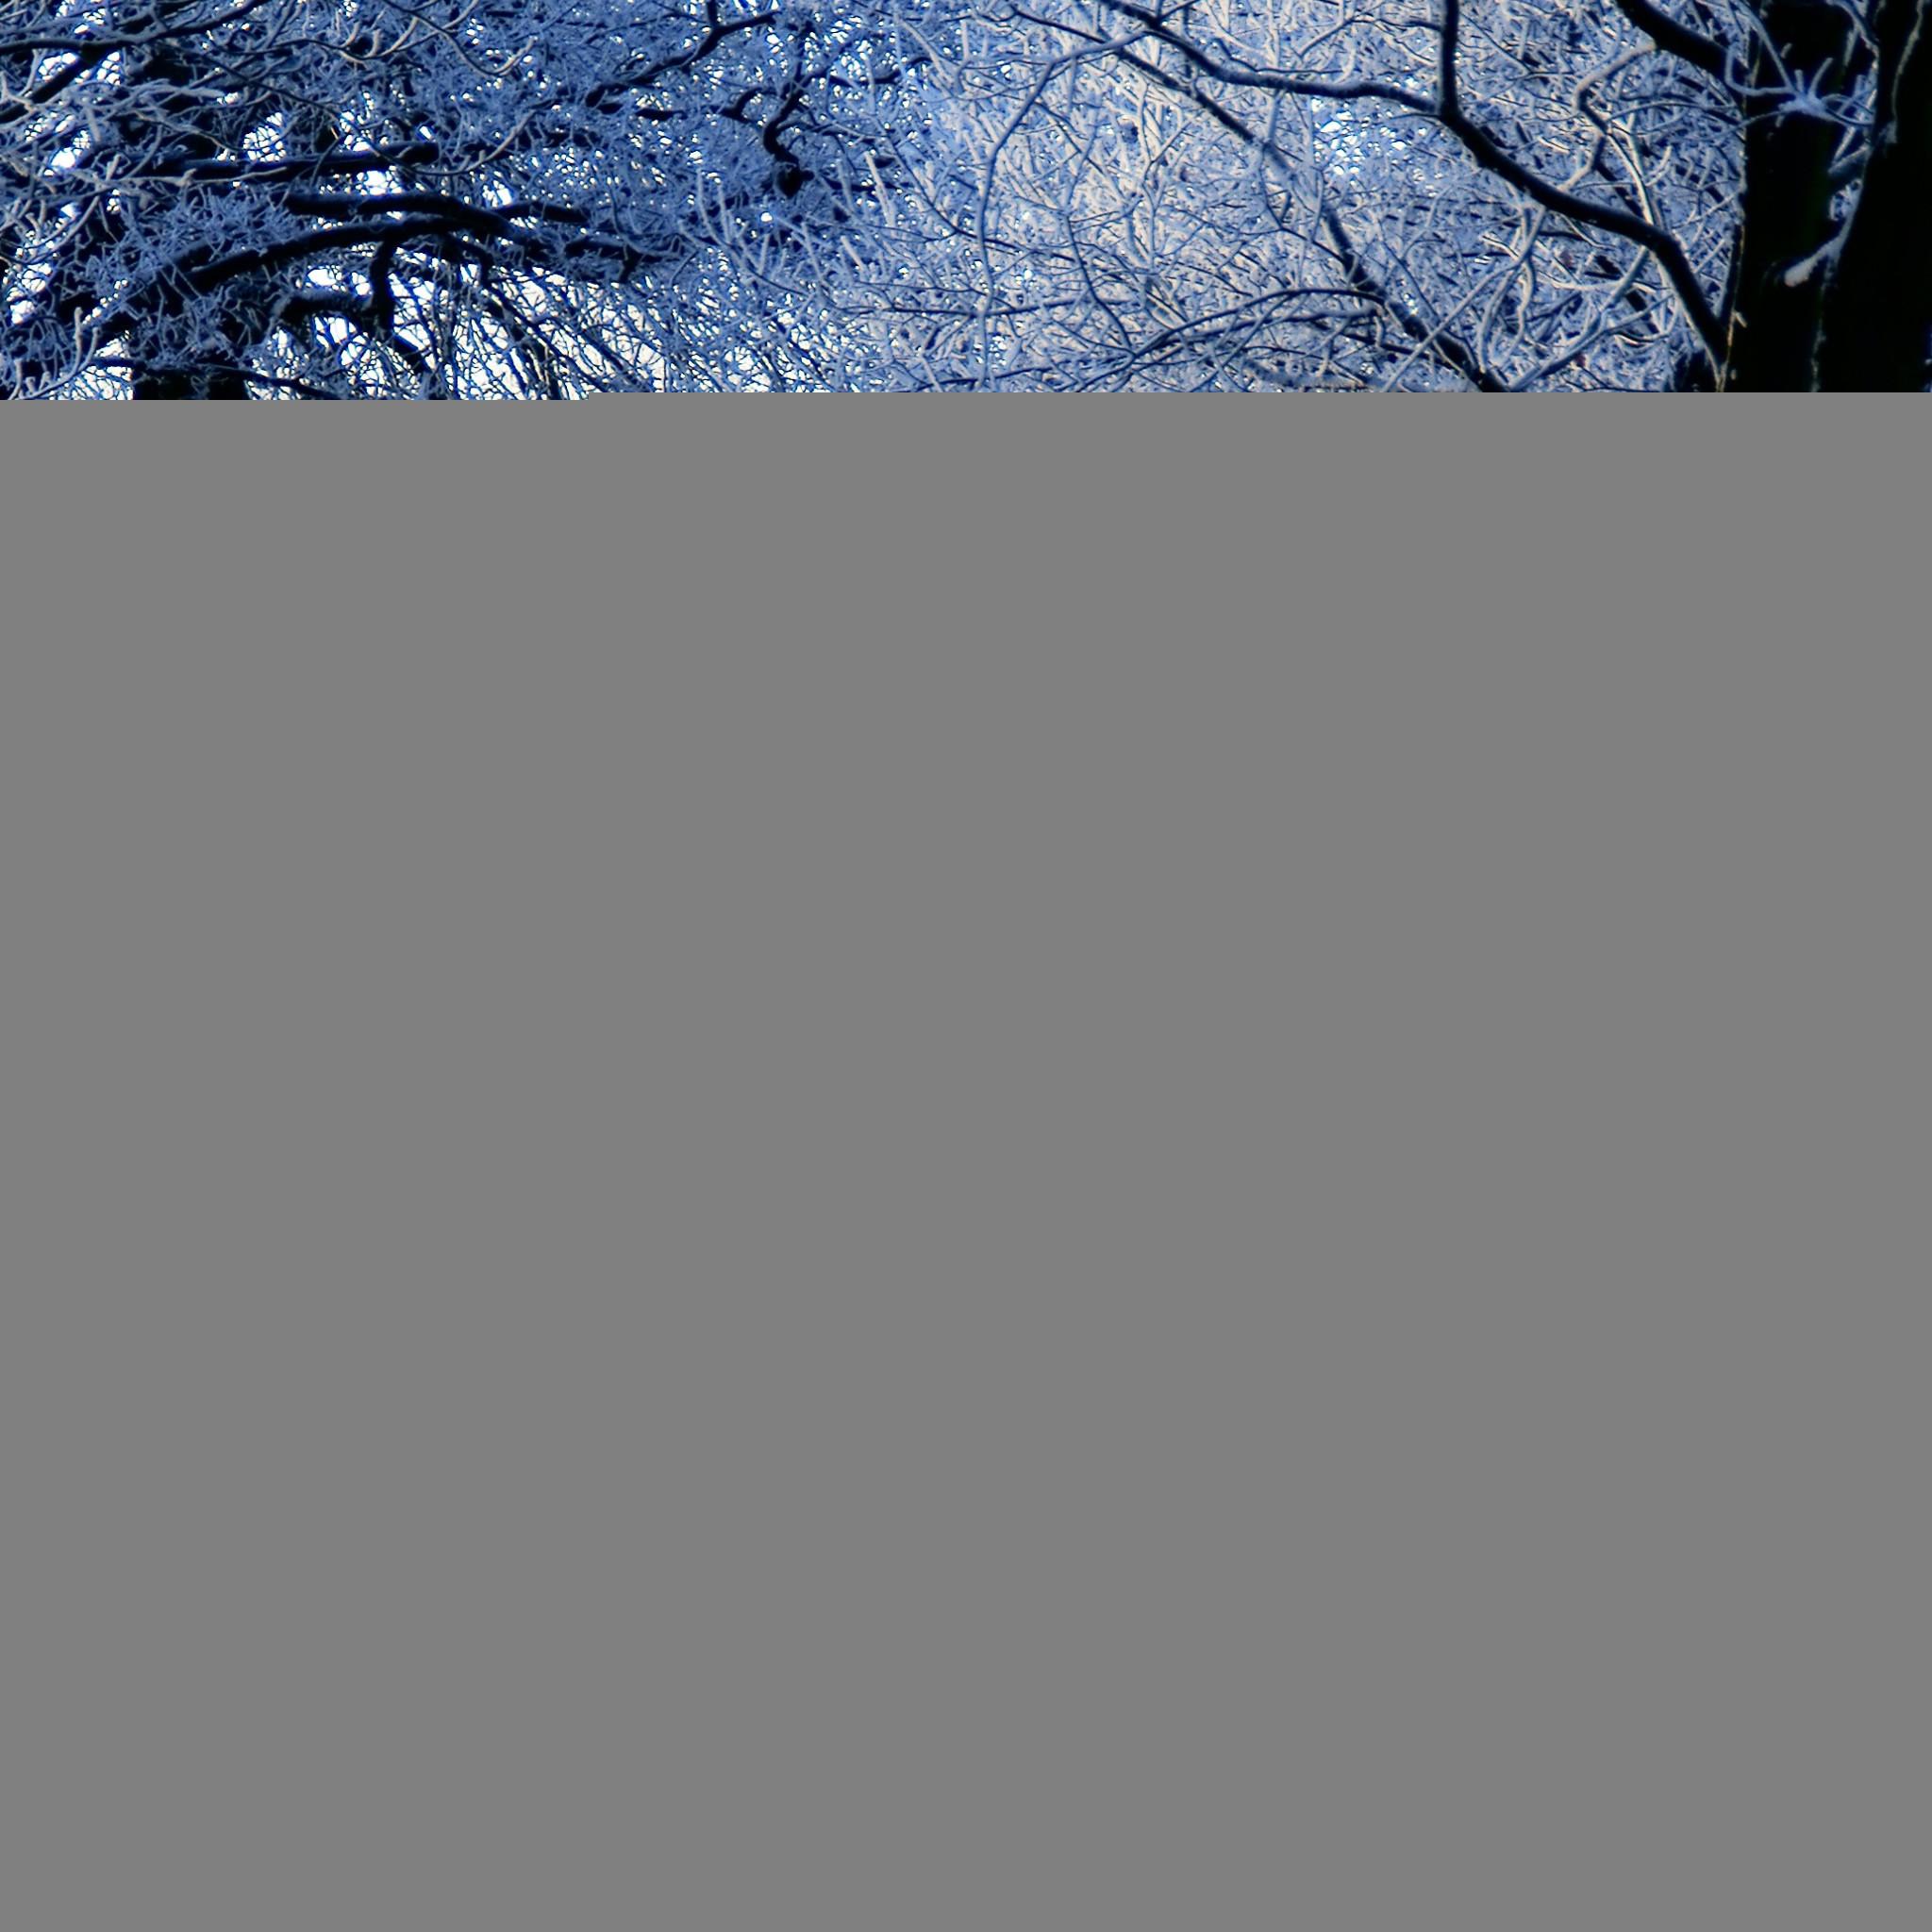 … winter road scene ipad air wallpaper download iphone wallpapers …